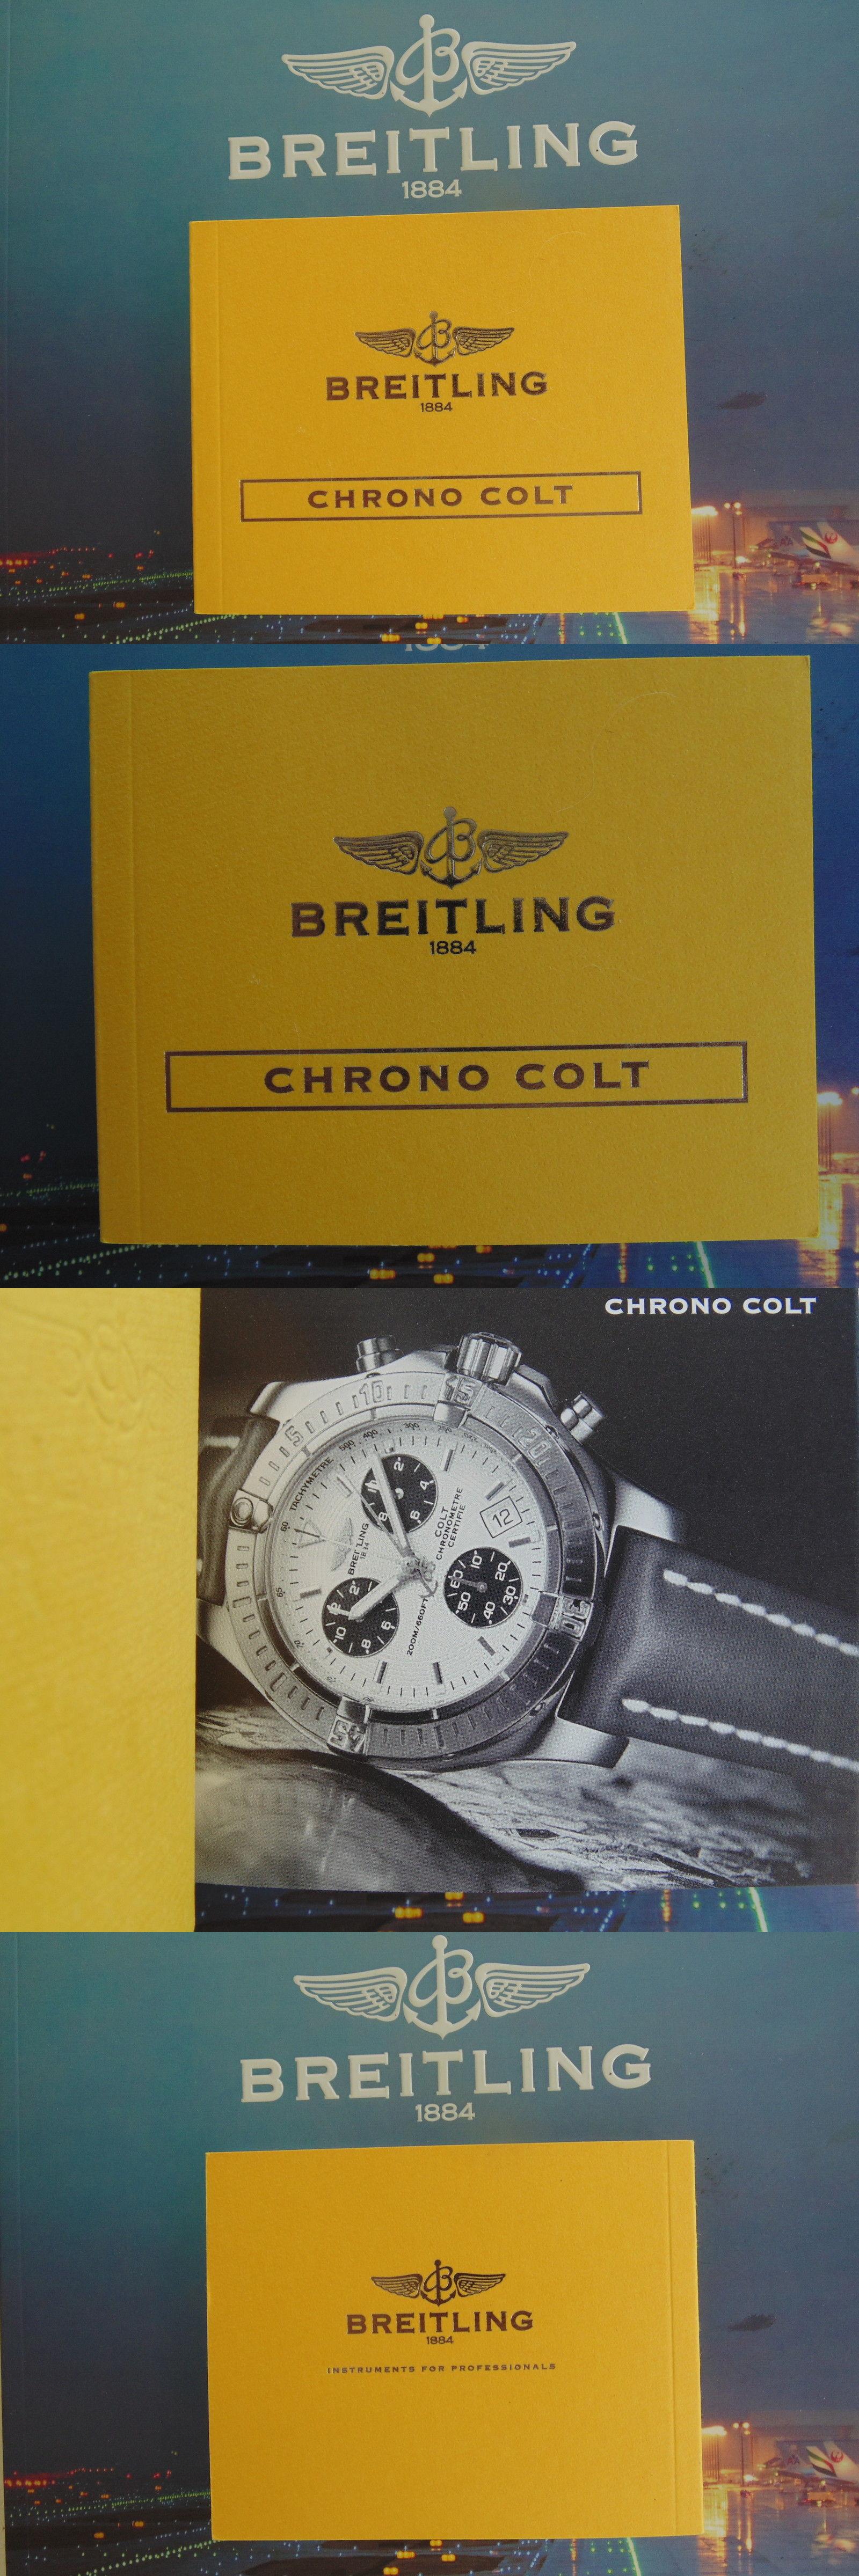 manuals and guides 93720 breitling colt 44 watch instruction rh pinterest com breitling colt user manual breitling colt automatic instruction manual